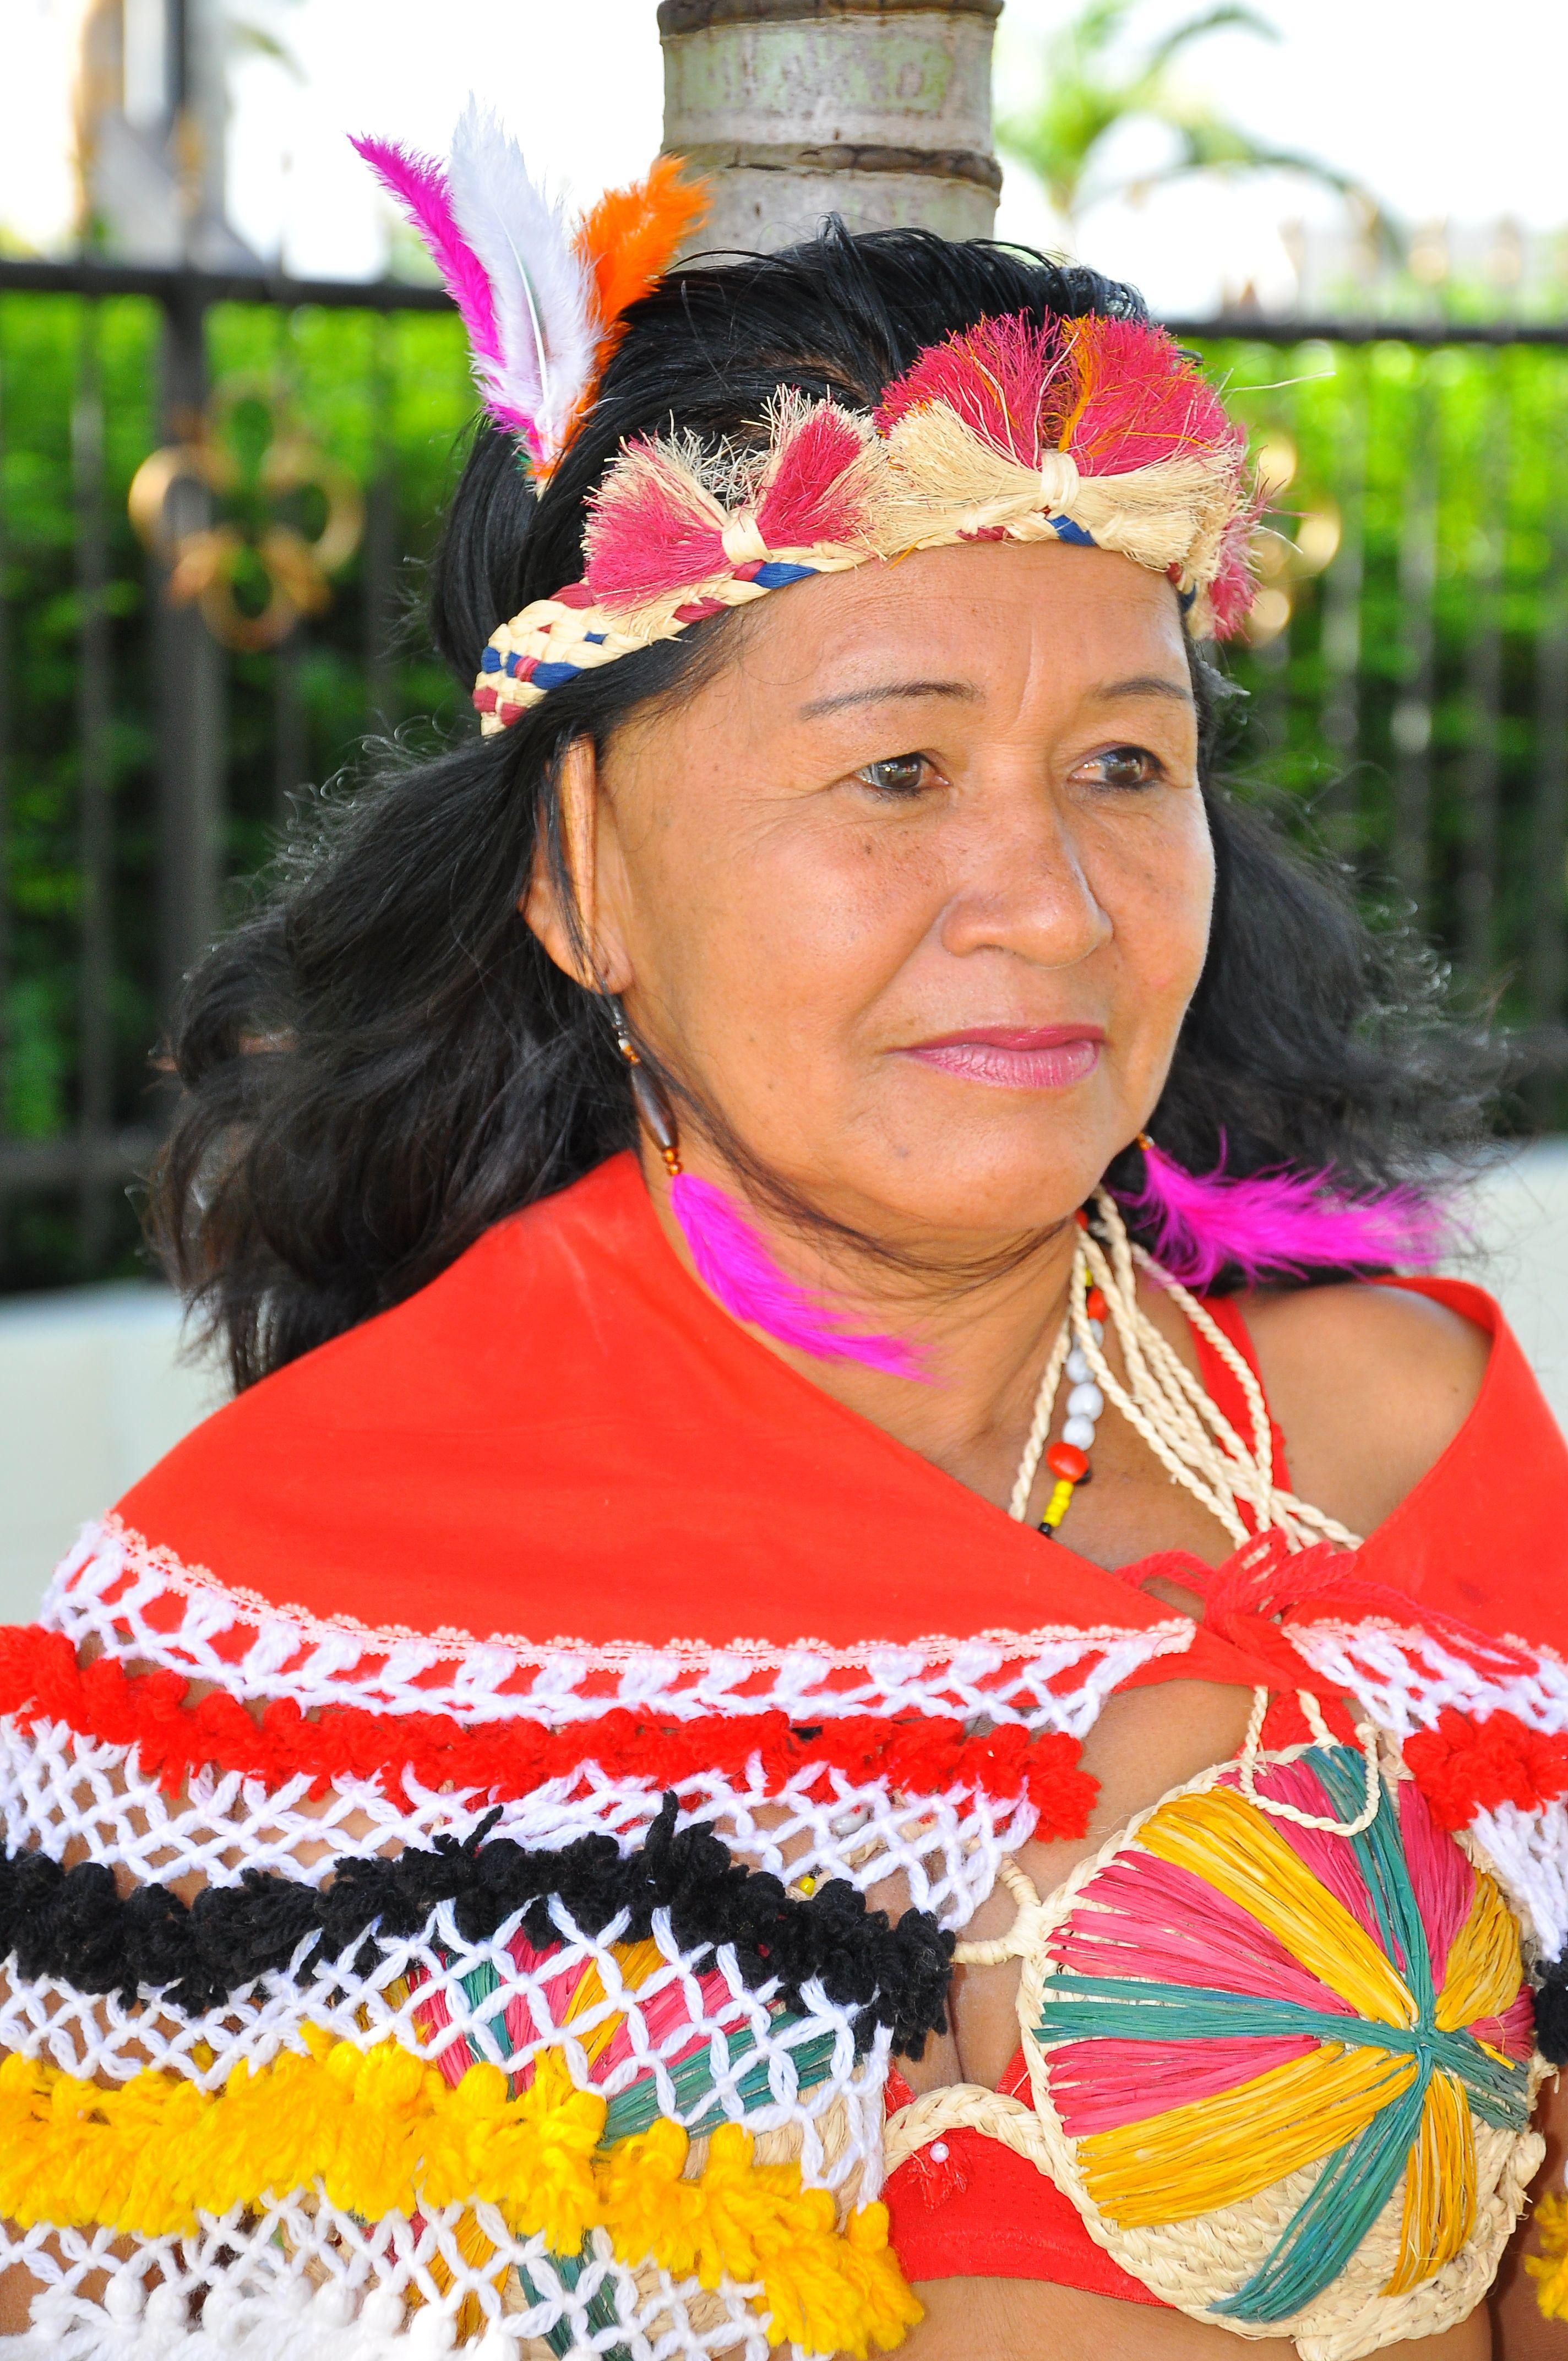 st.kitts indigenous people | ... De Fretas Guyana WI ...